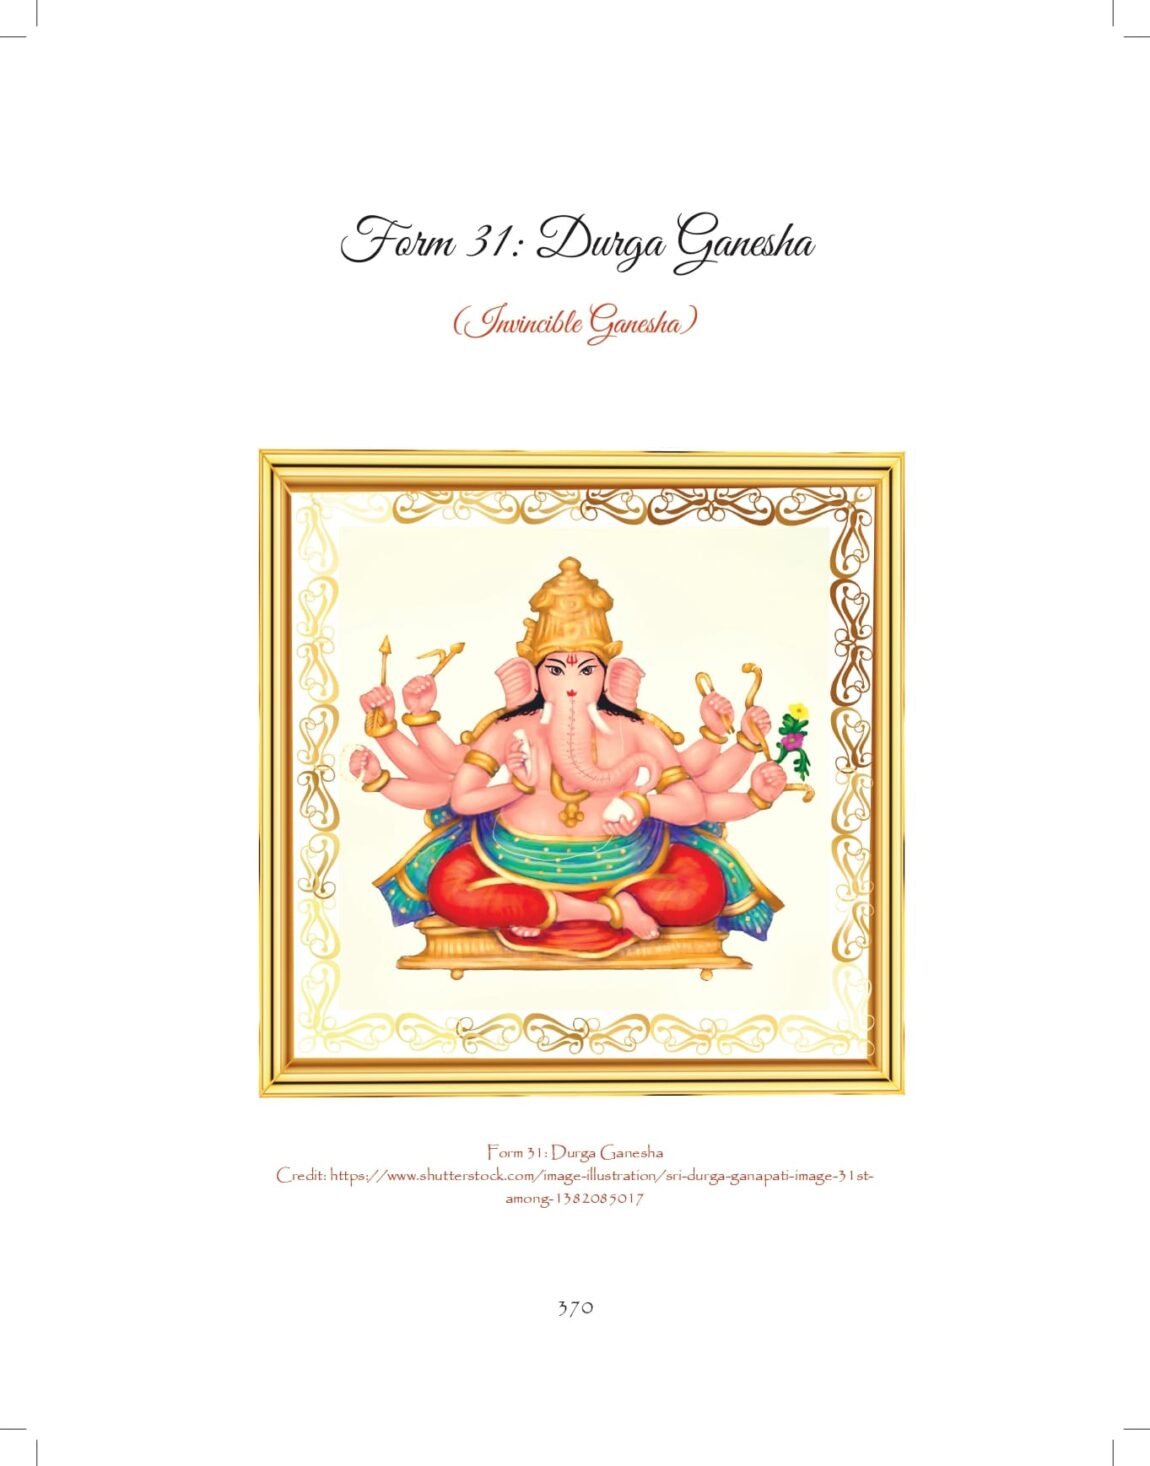 Ganesh-print_pages-to-jpg-0370.jpg